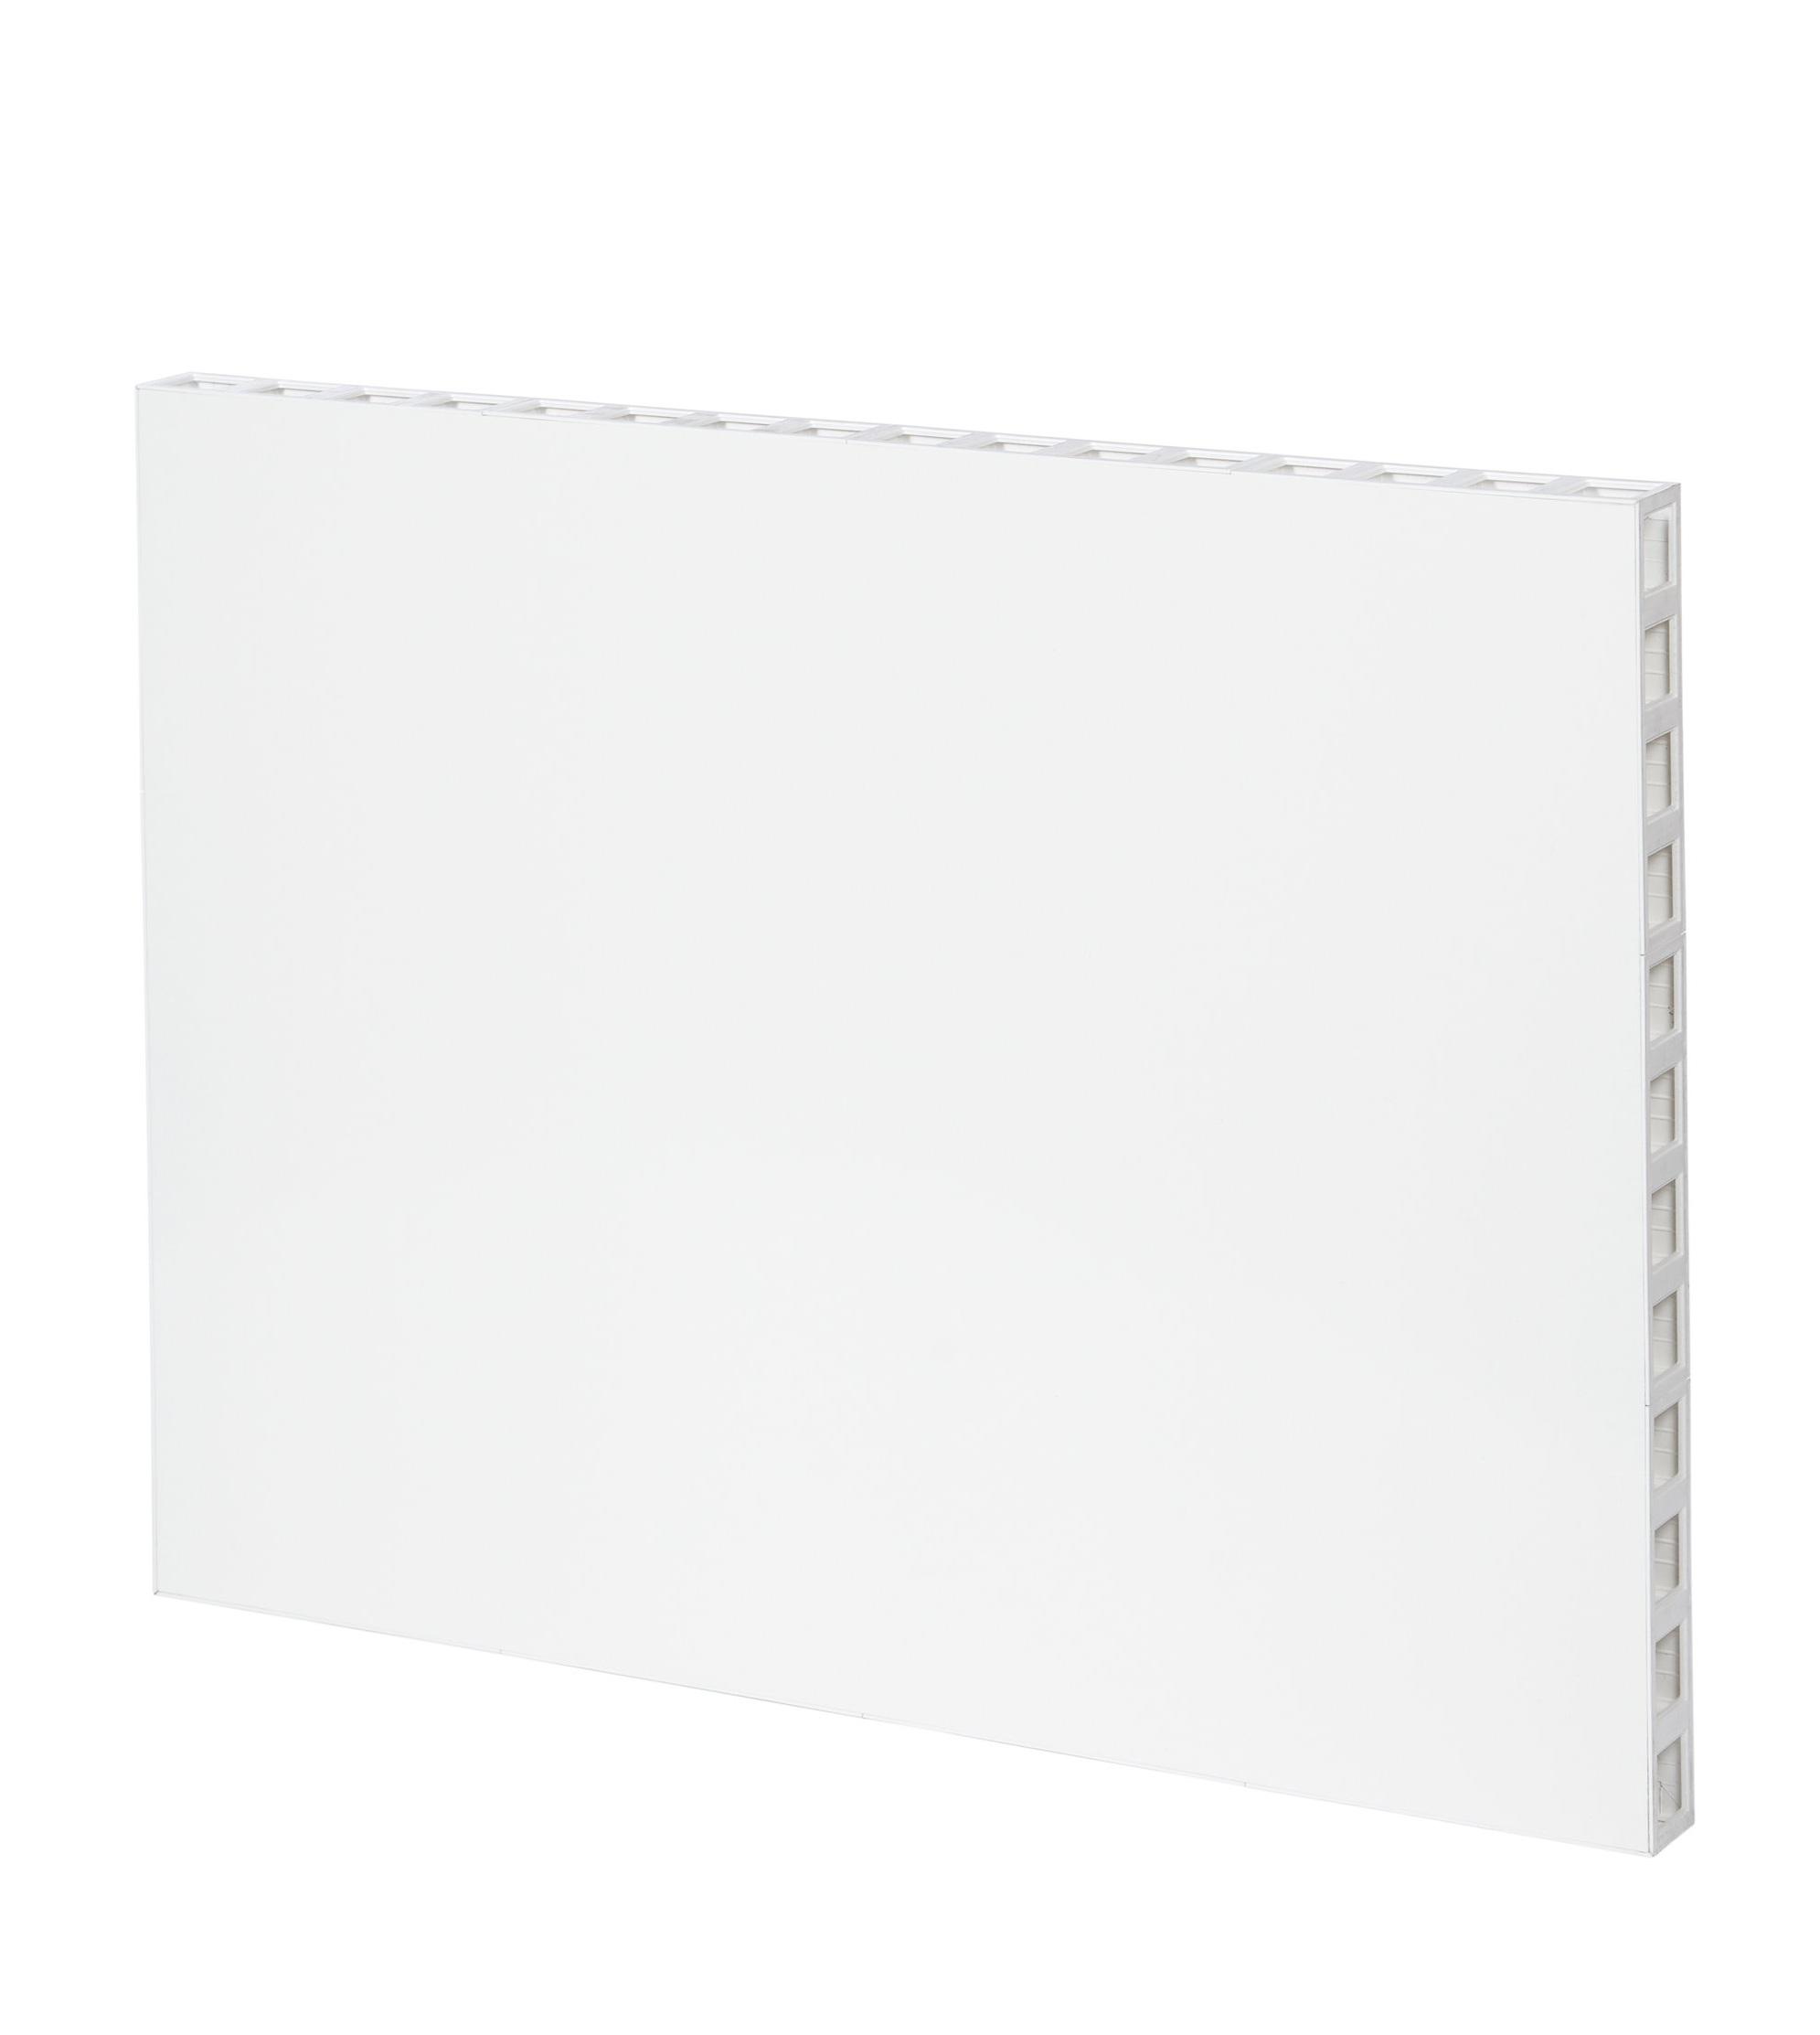 everpanel 3ft x 4ft modular wall panels